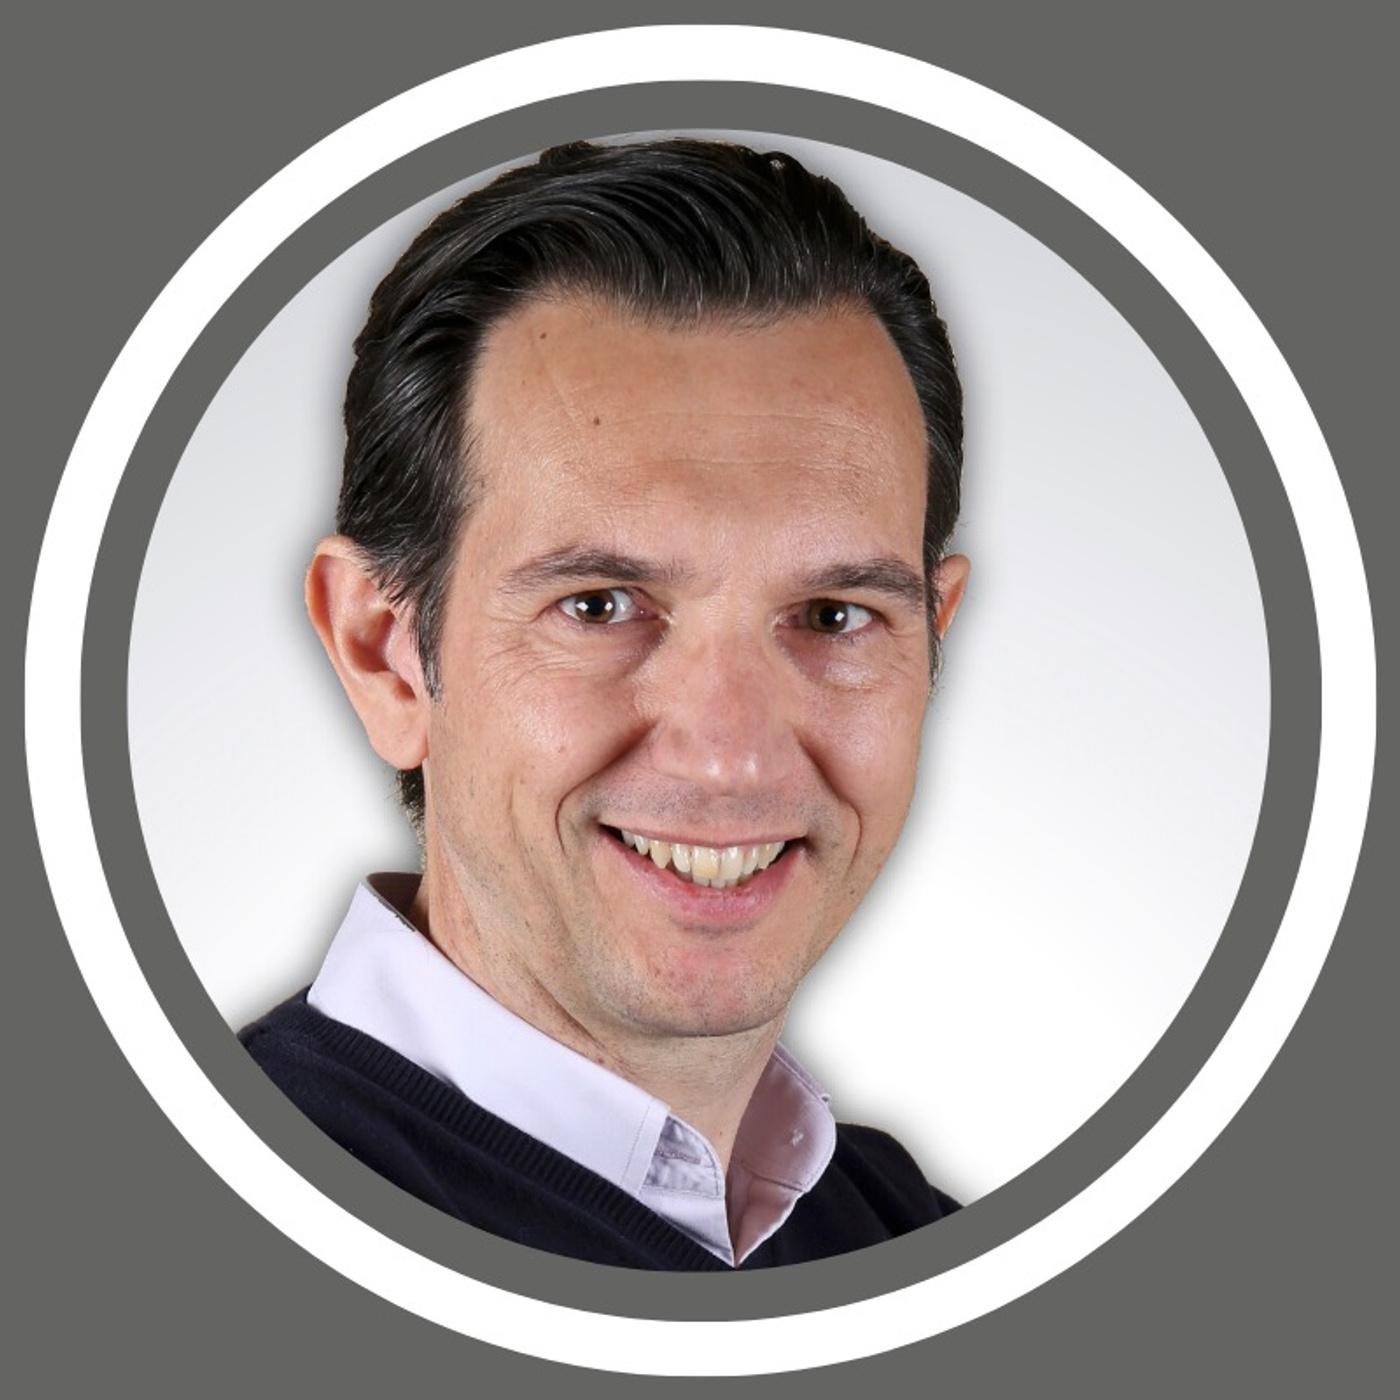 Tom Meyers - Author Futurize Yourself (NL)